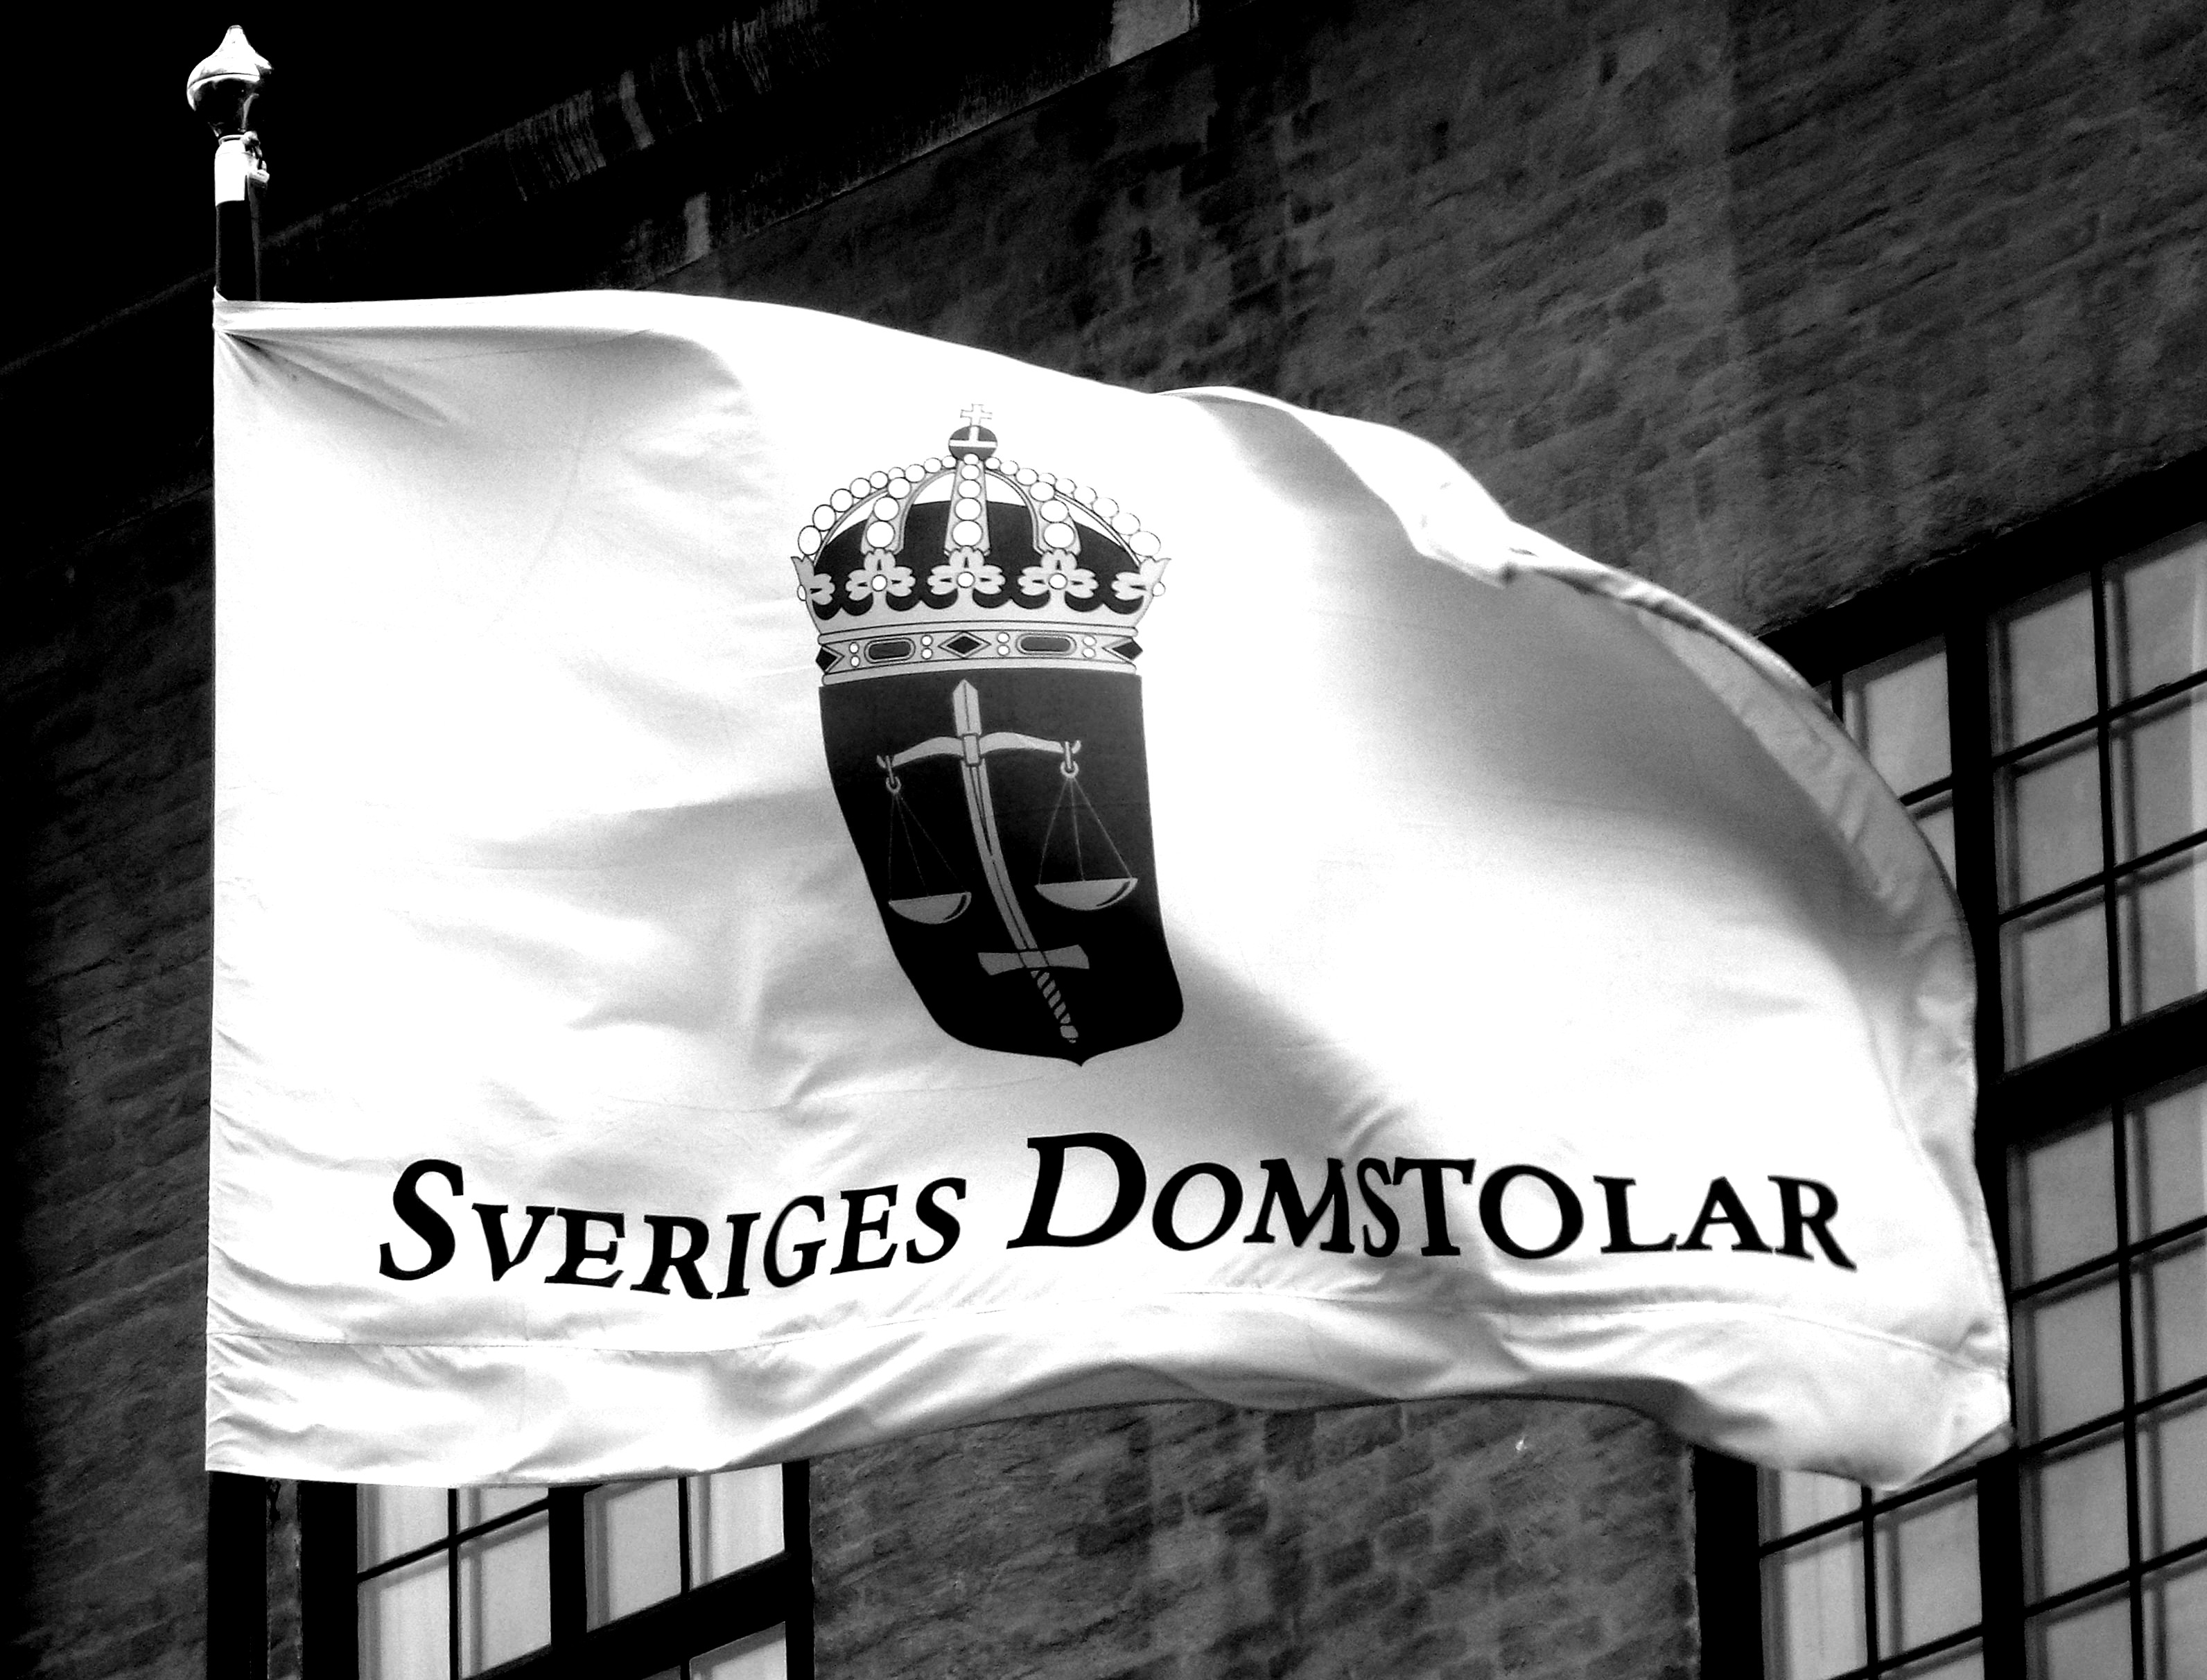 Sveriges_Domstolar_flagga_2013